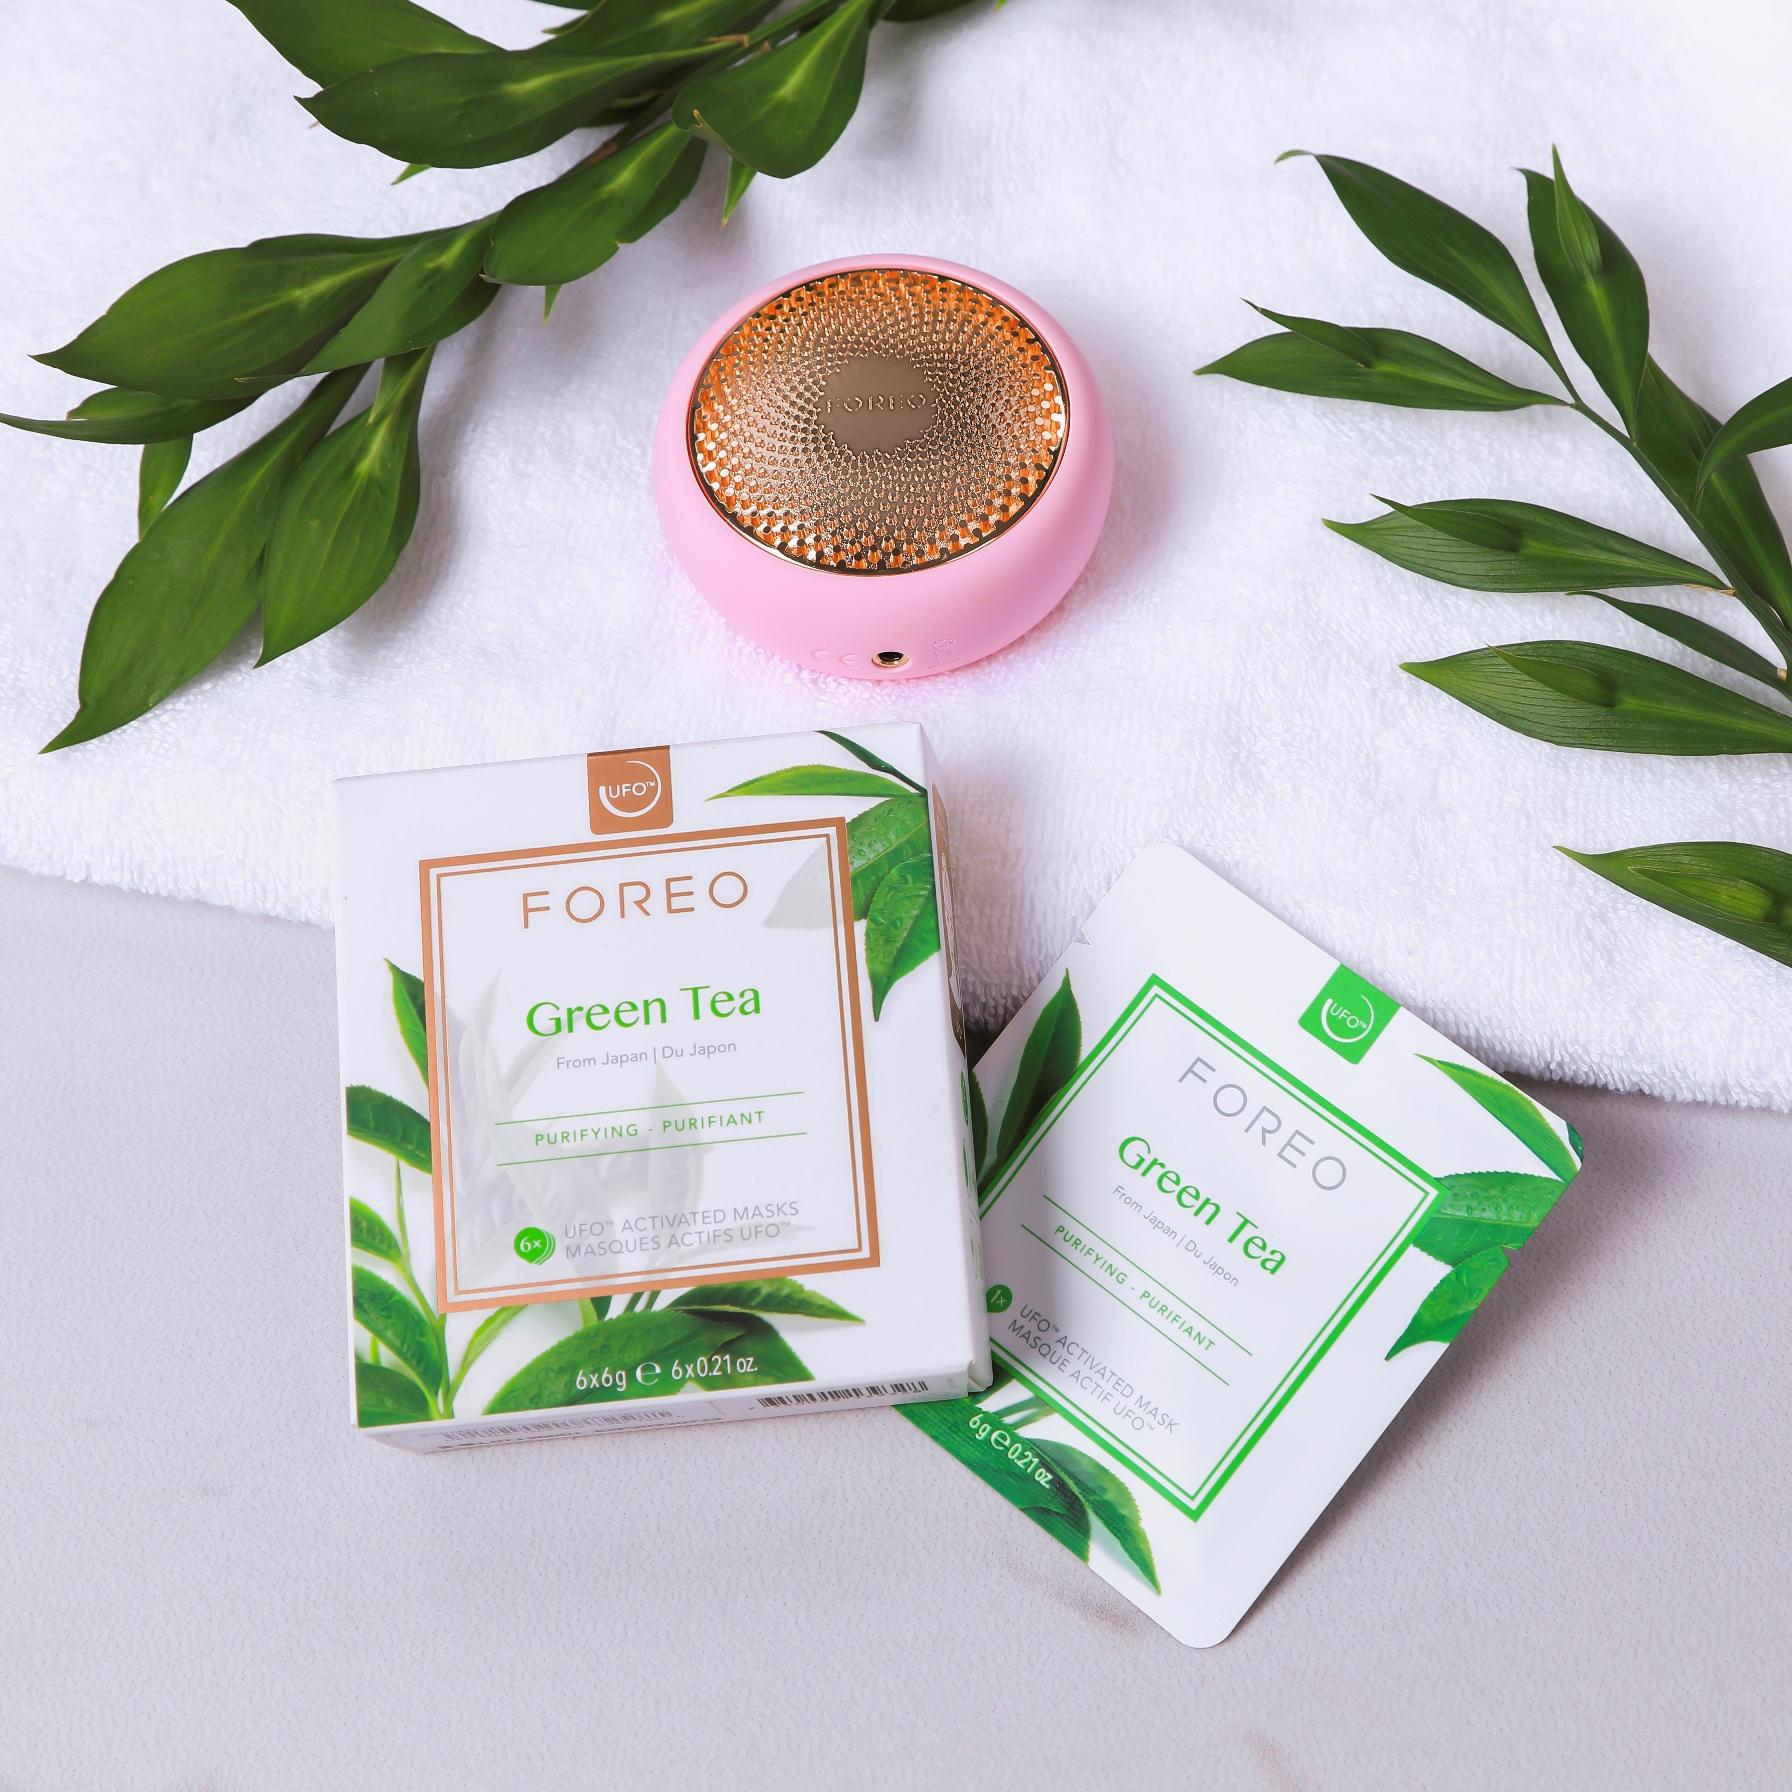 07_foreo_green_tea_lifestyle.jpg